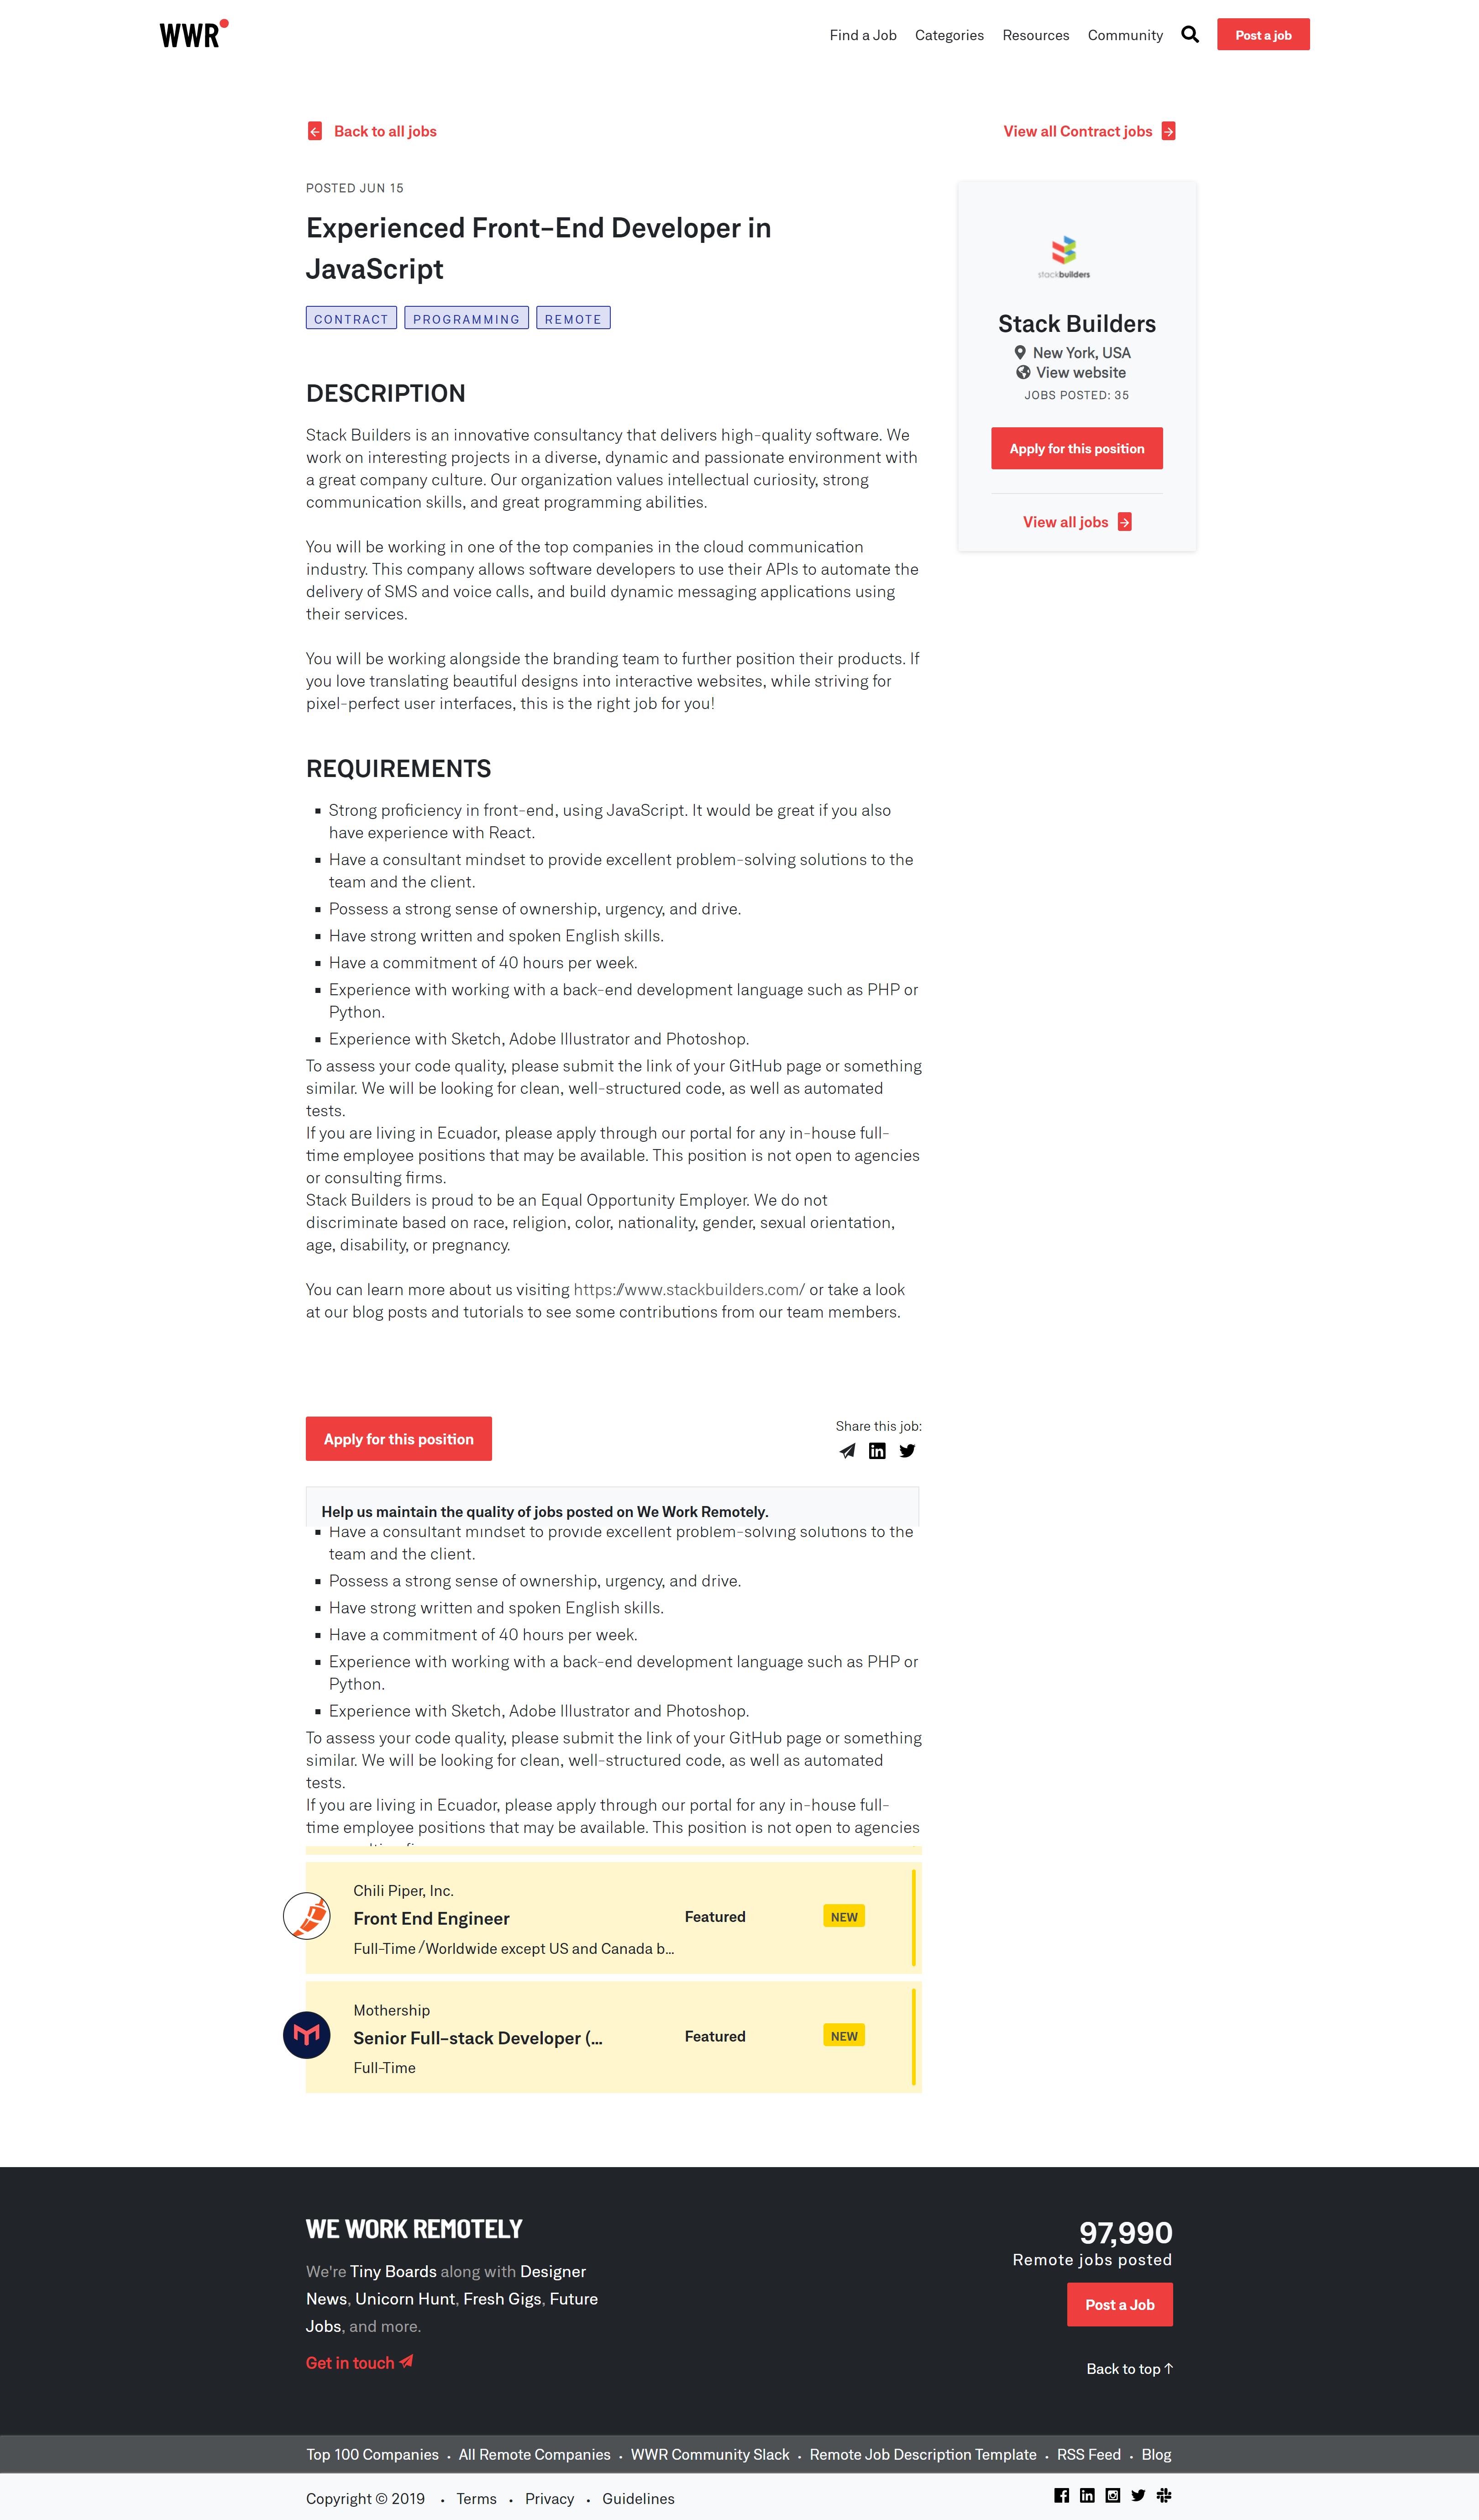 Make a better boilerplate post · Issue #6 · ugglr/Remote